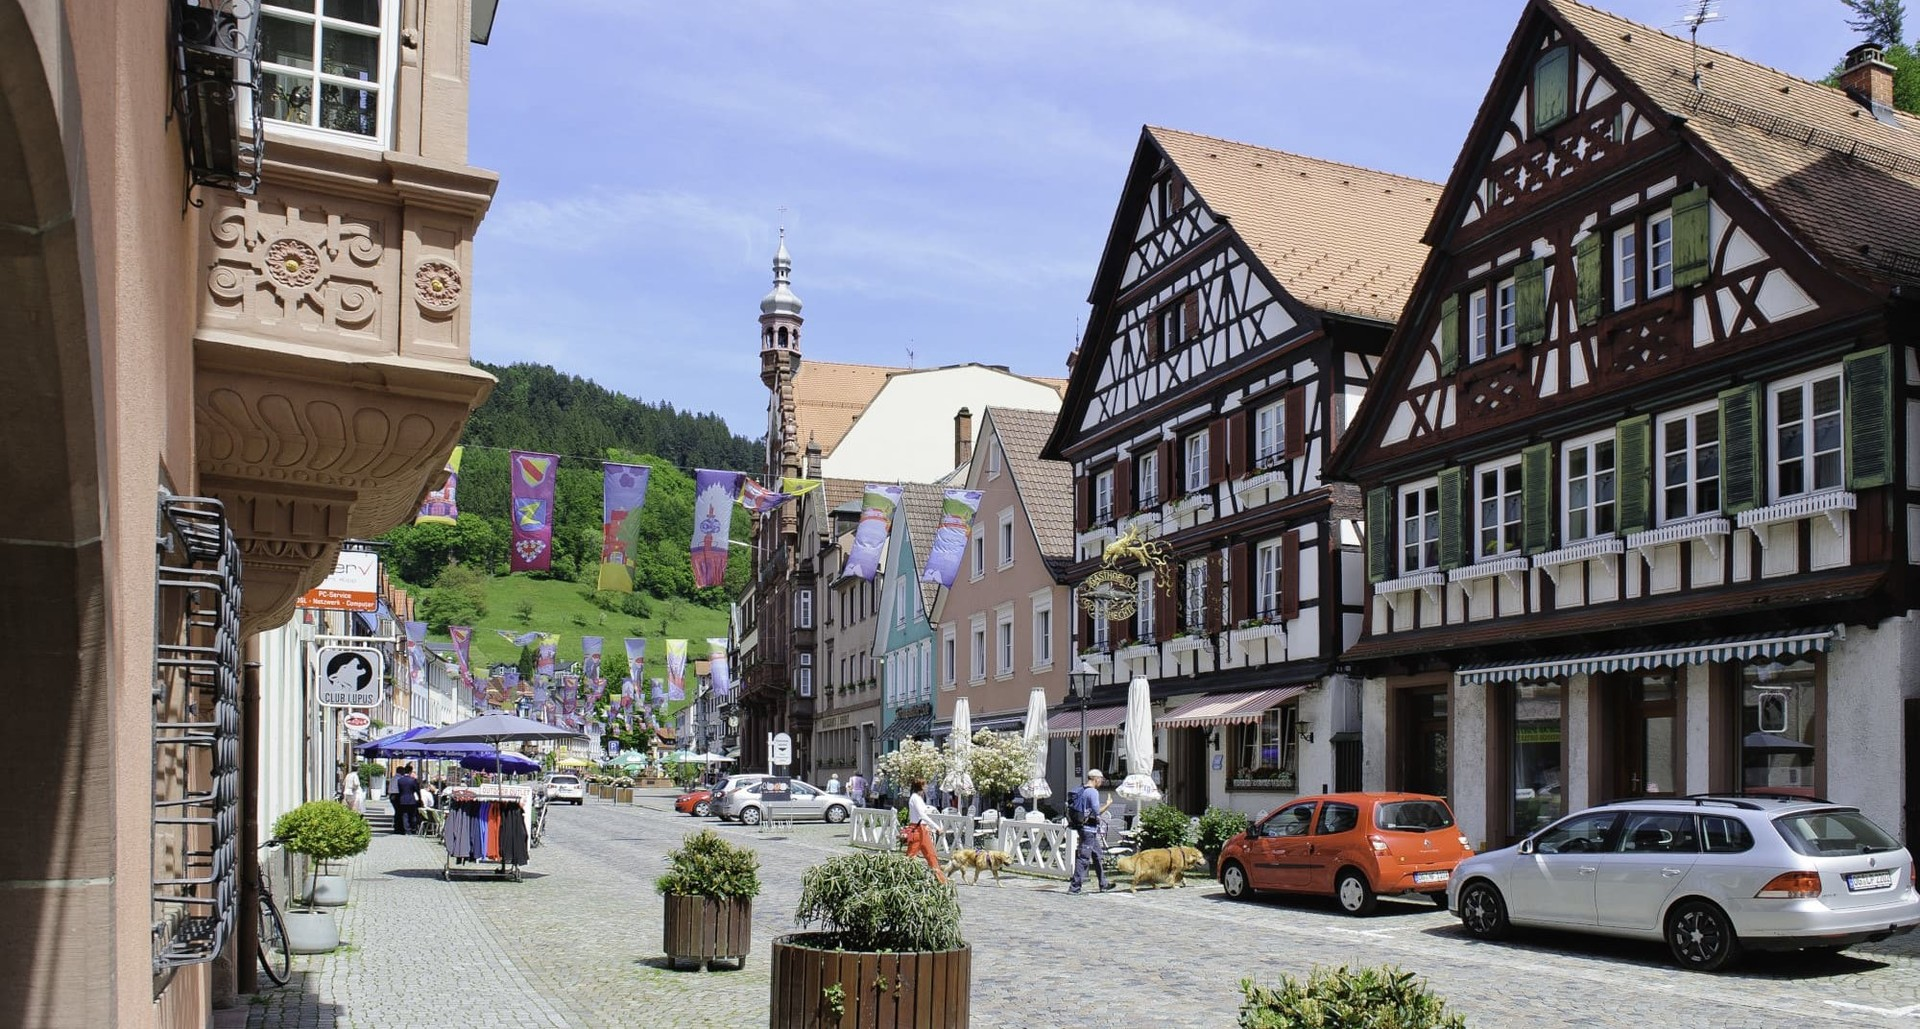 Wolfach Altstadt Hauptstraße Innenstadt